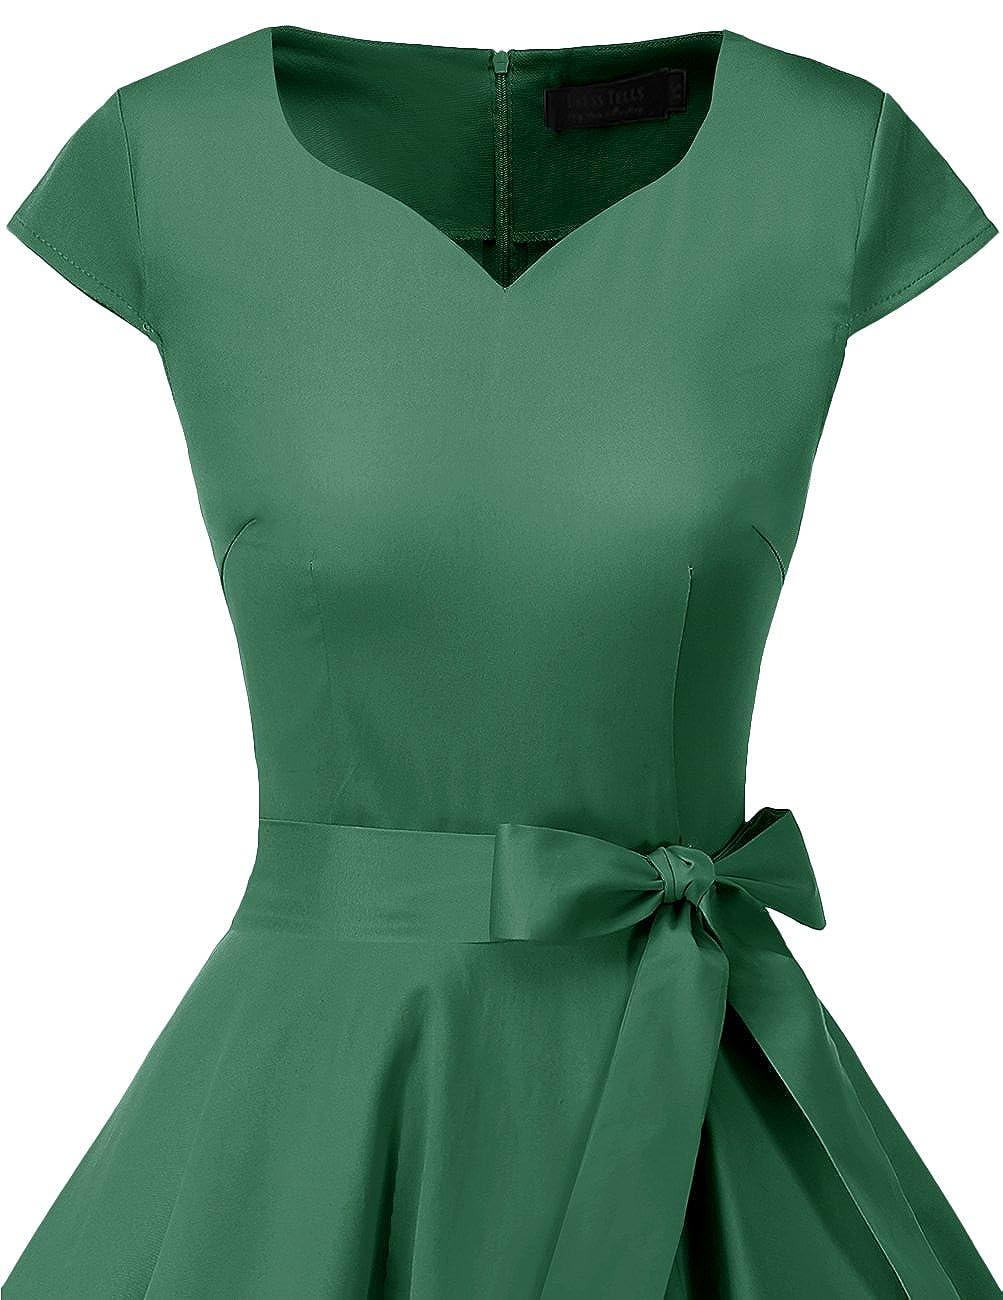 Dresstells Retro 1950s Polka Dot Cocktail Vintage Swing Cap-Sleeves Dress